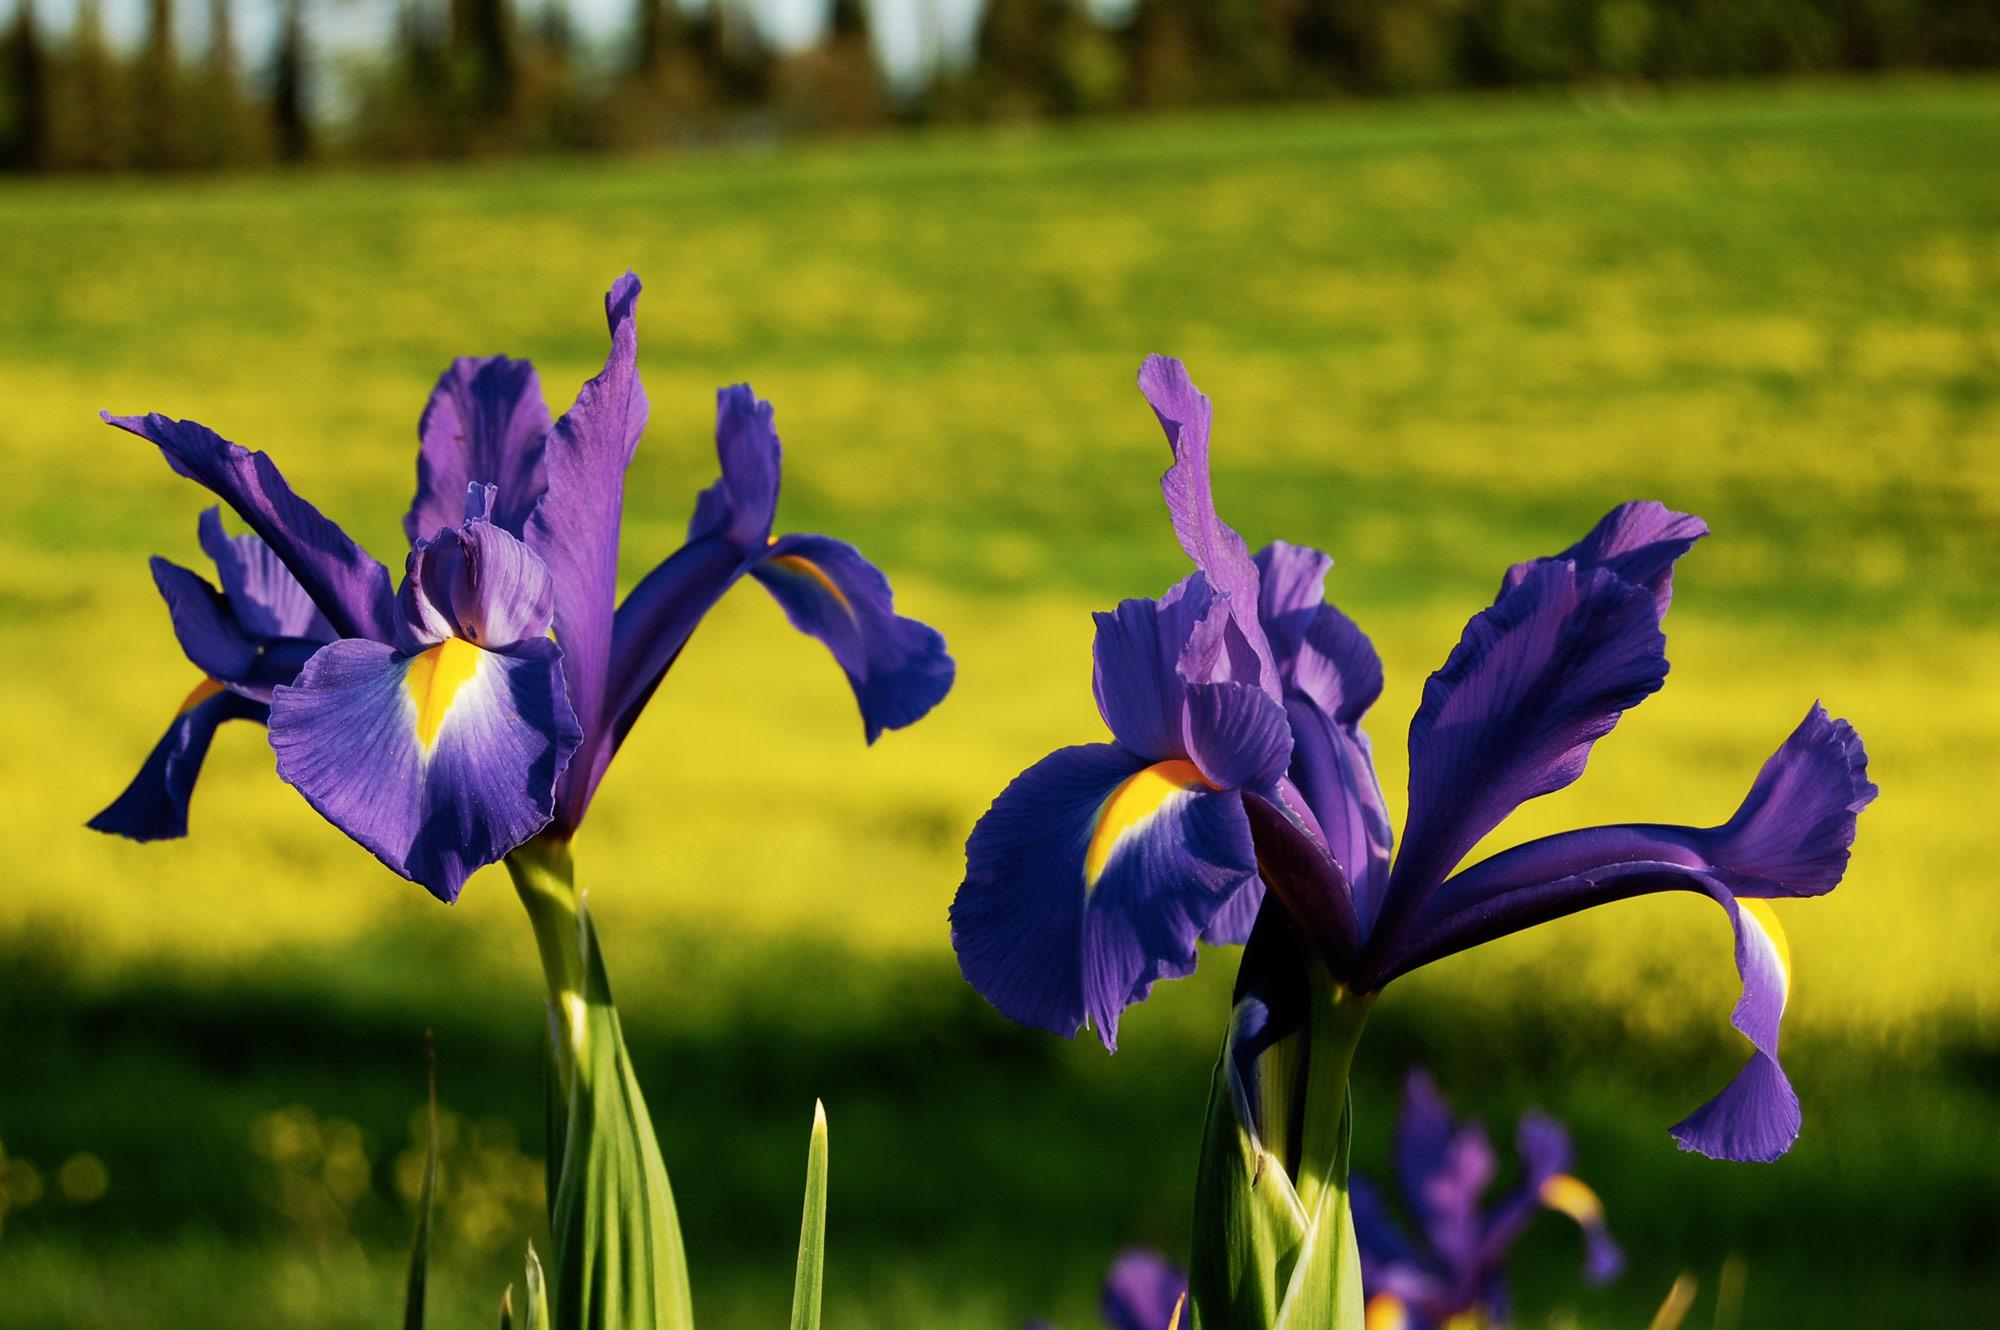 Villa in Toscana con Iris